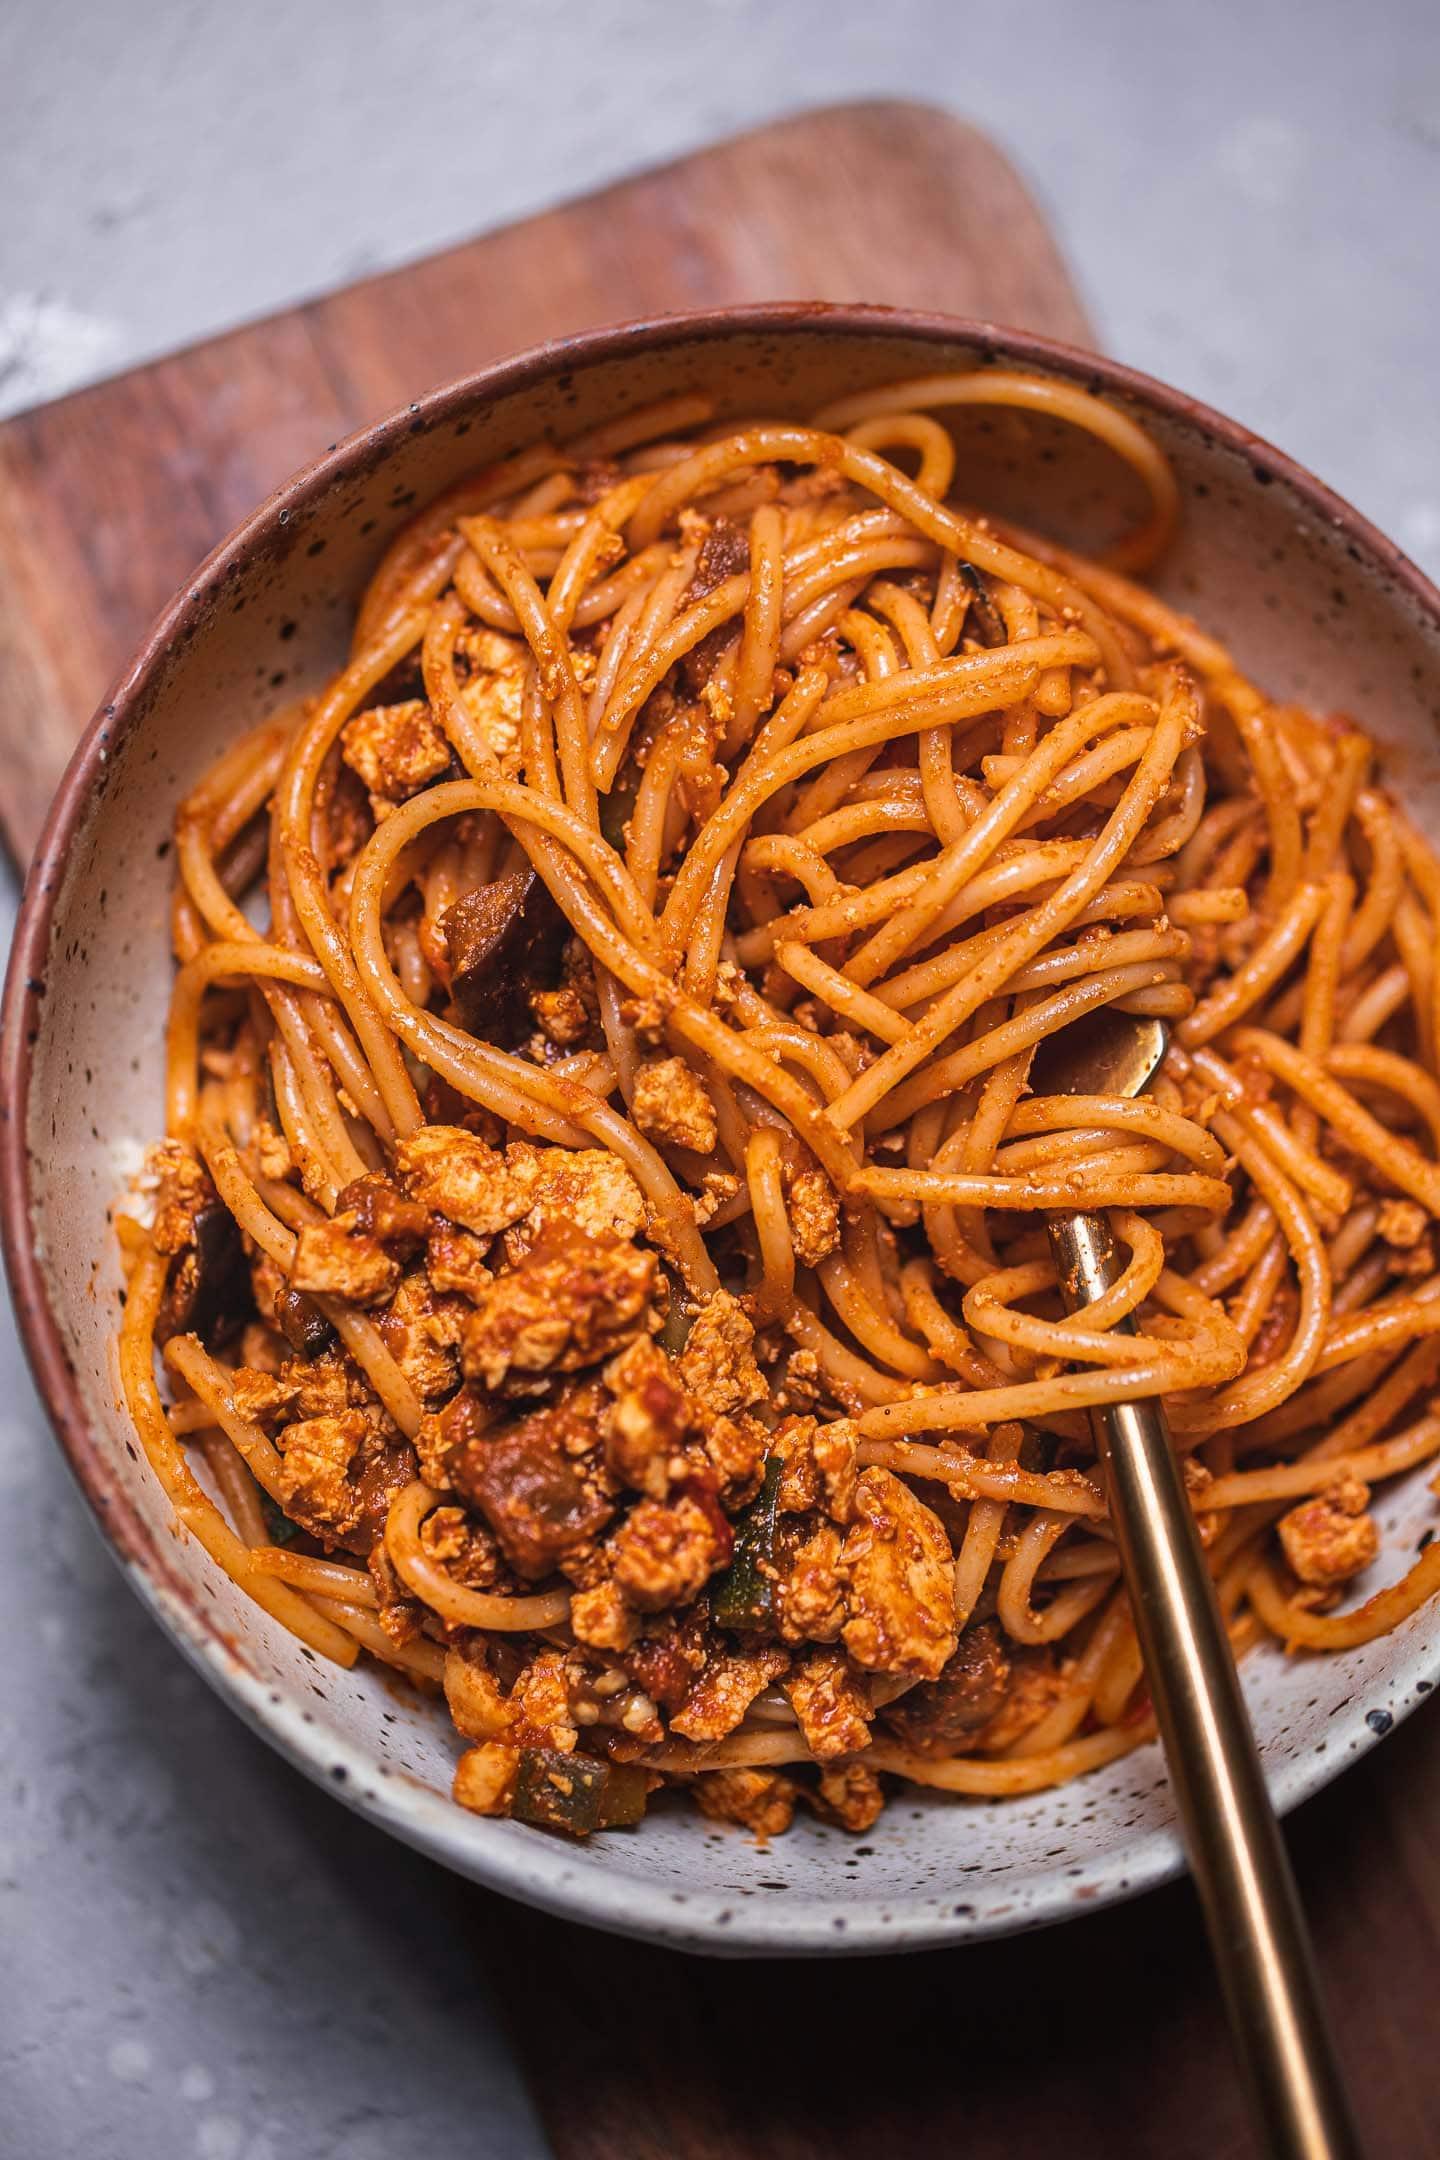 Tomato sauce pasta in a bowl